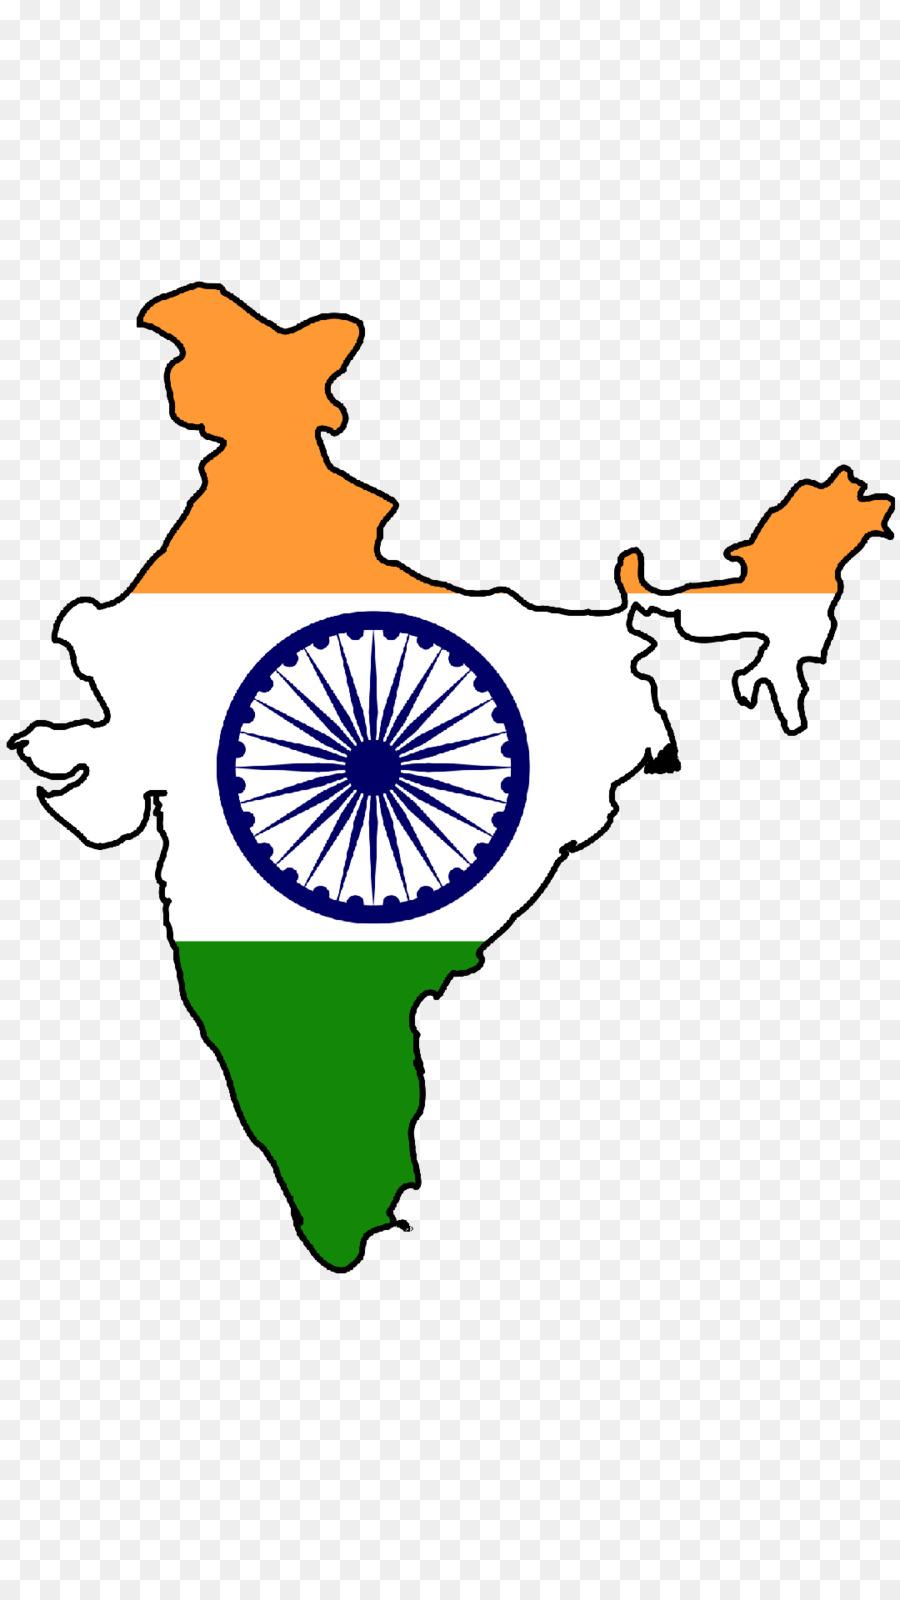 Bandera de la India Mapa de la bandera Nacional - la india mapa ...